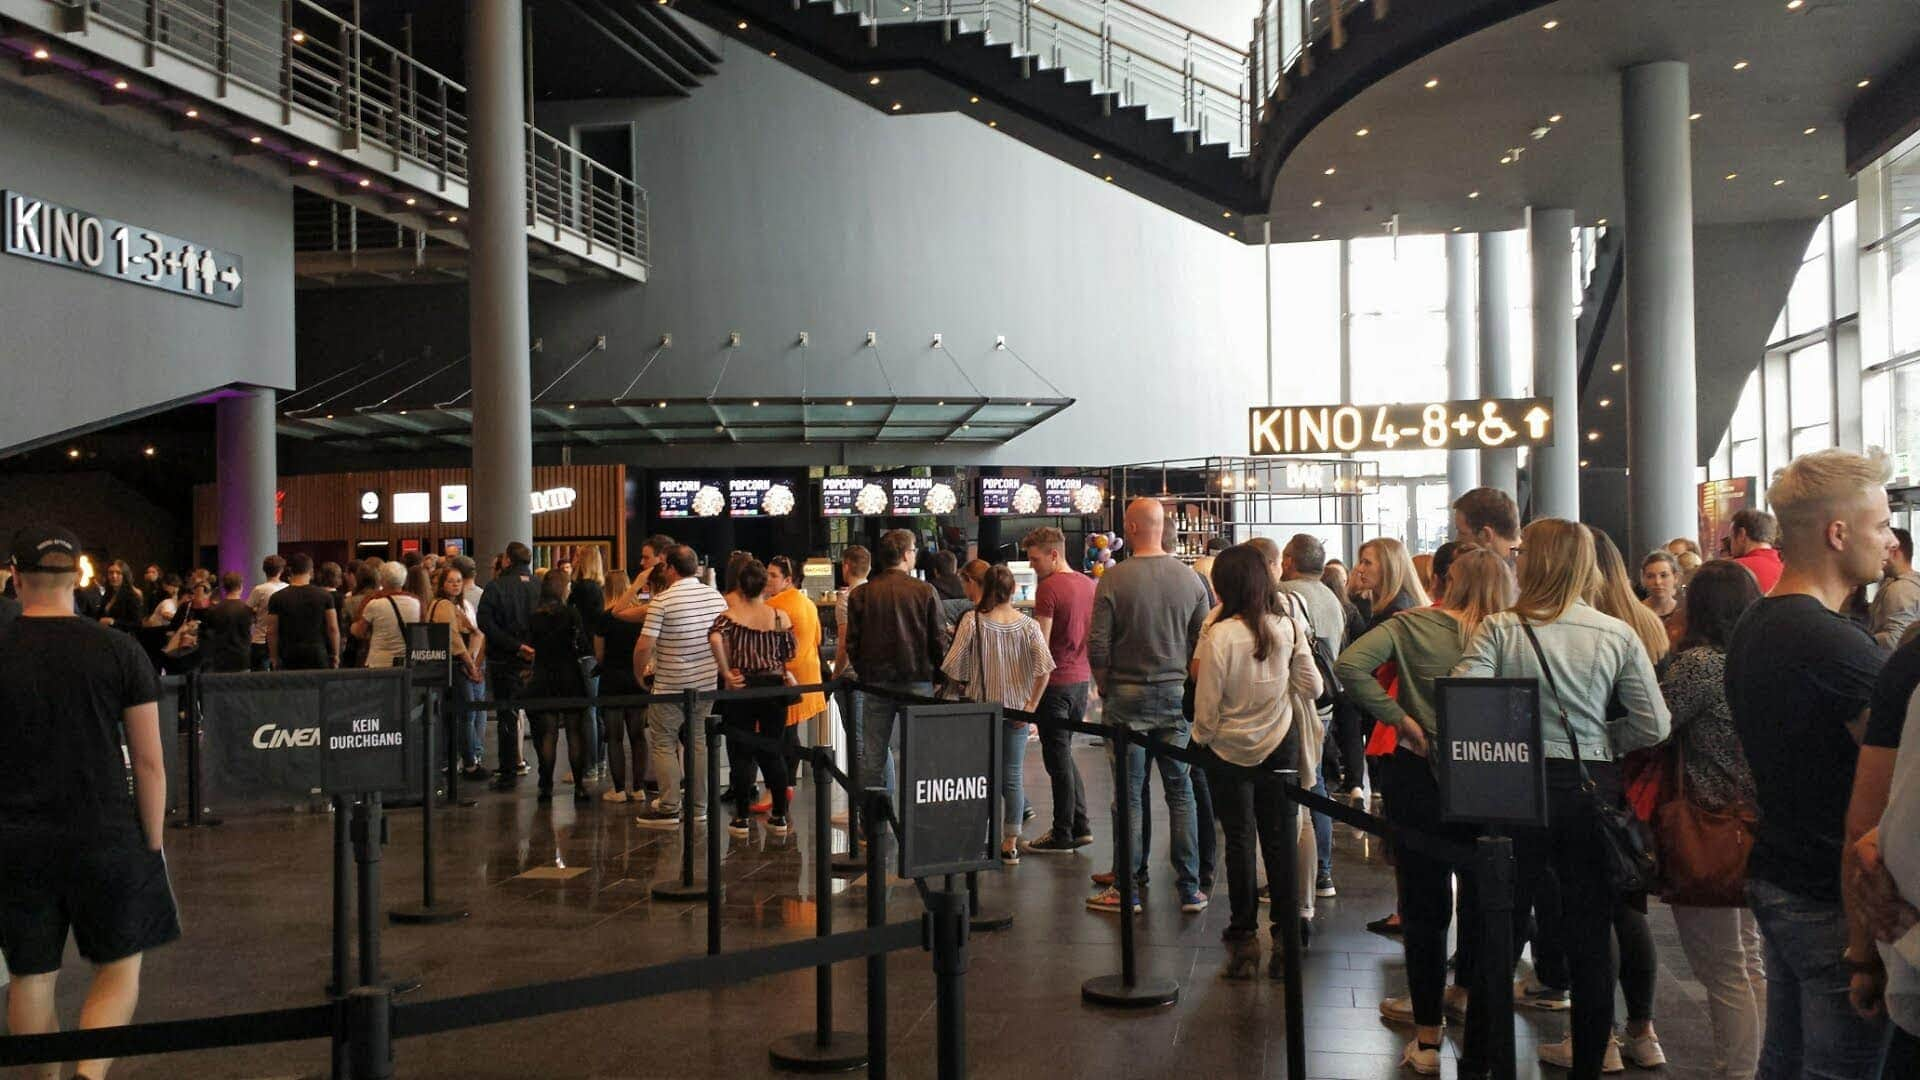 Cinemaxx Regensburg Star Wars